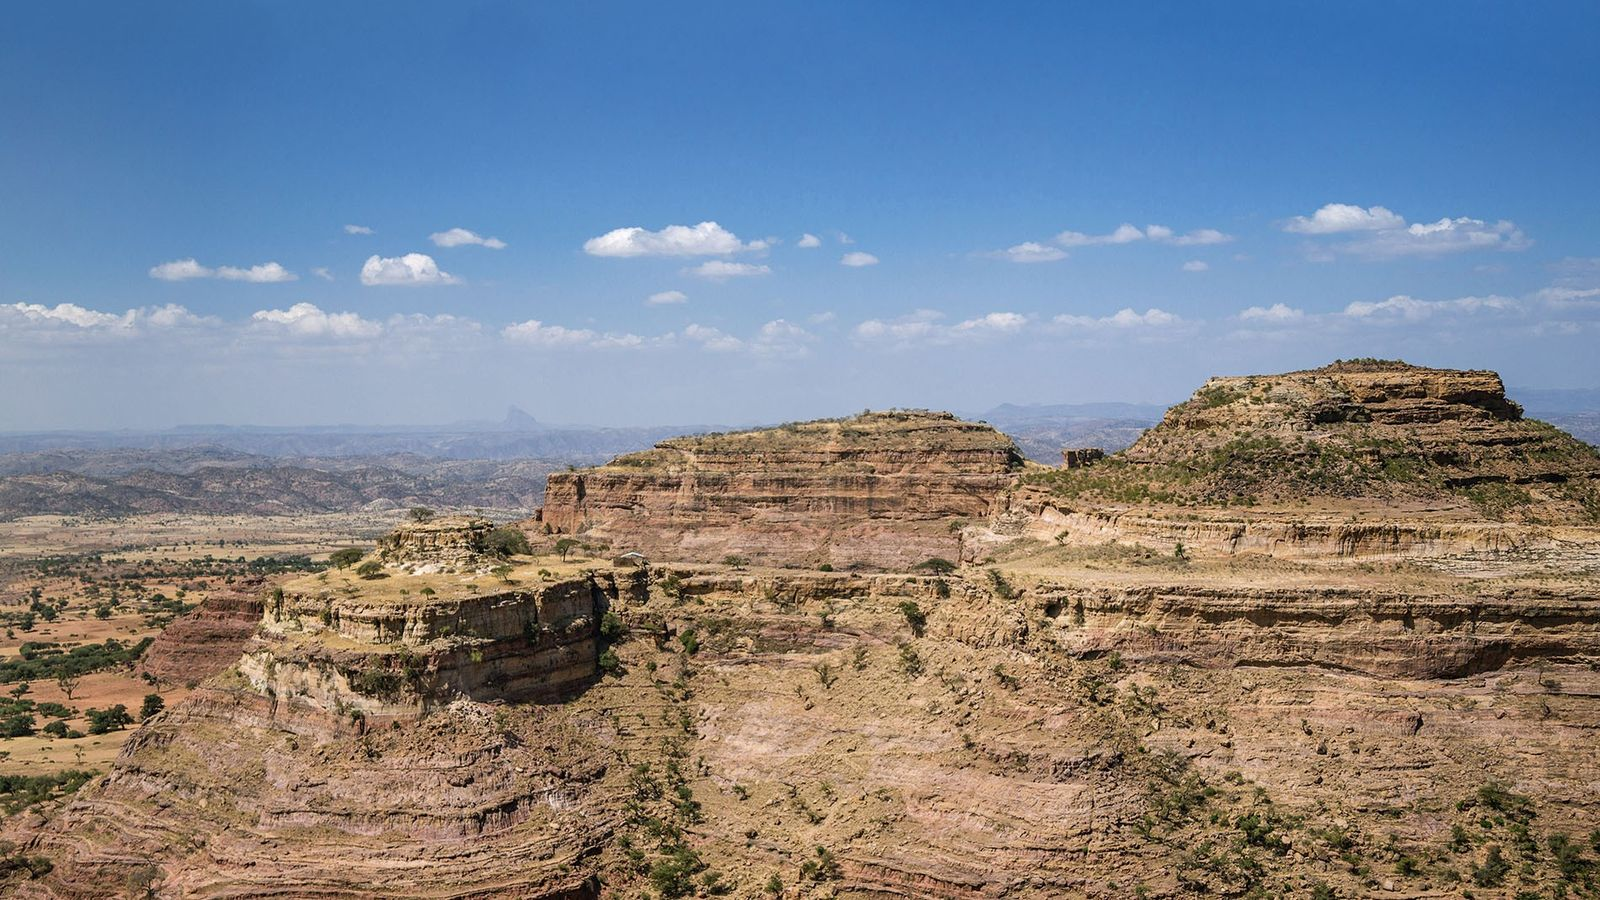 Sandstone mountains in Tigray region.